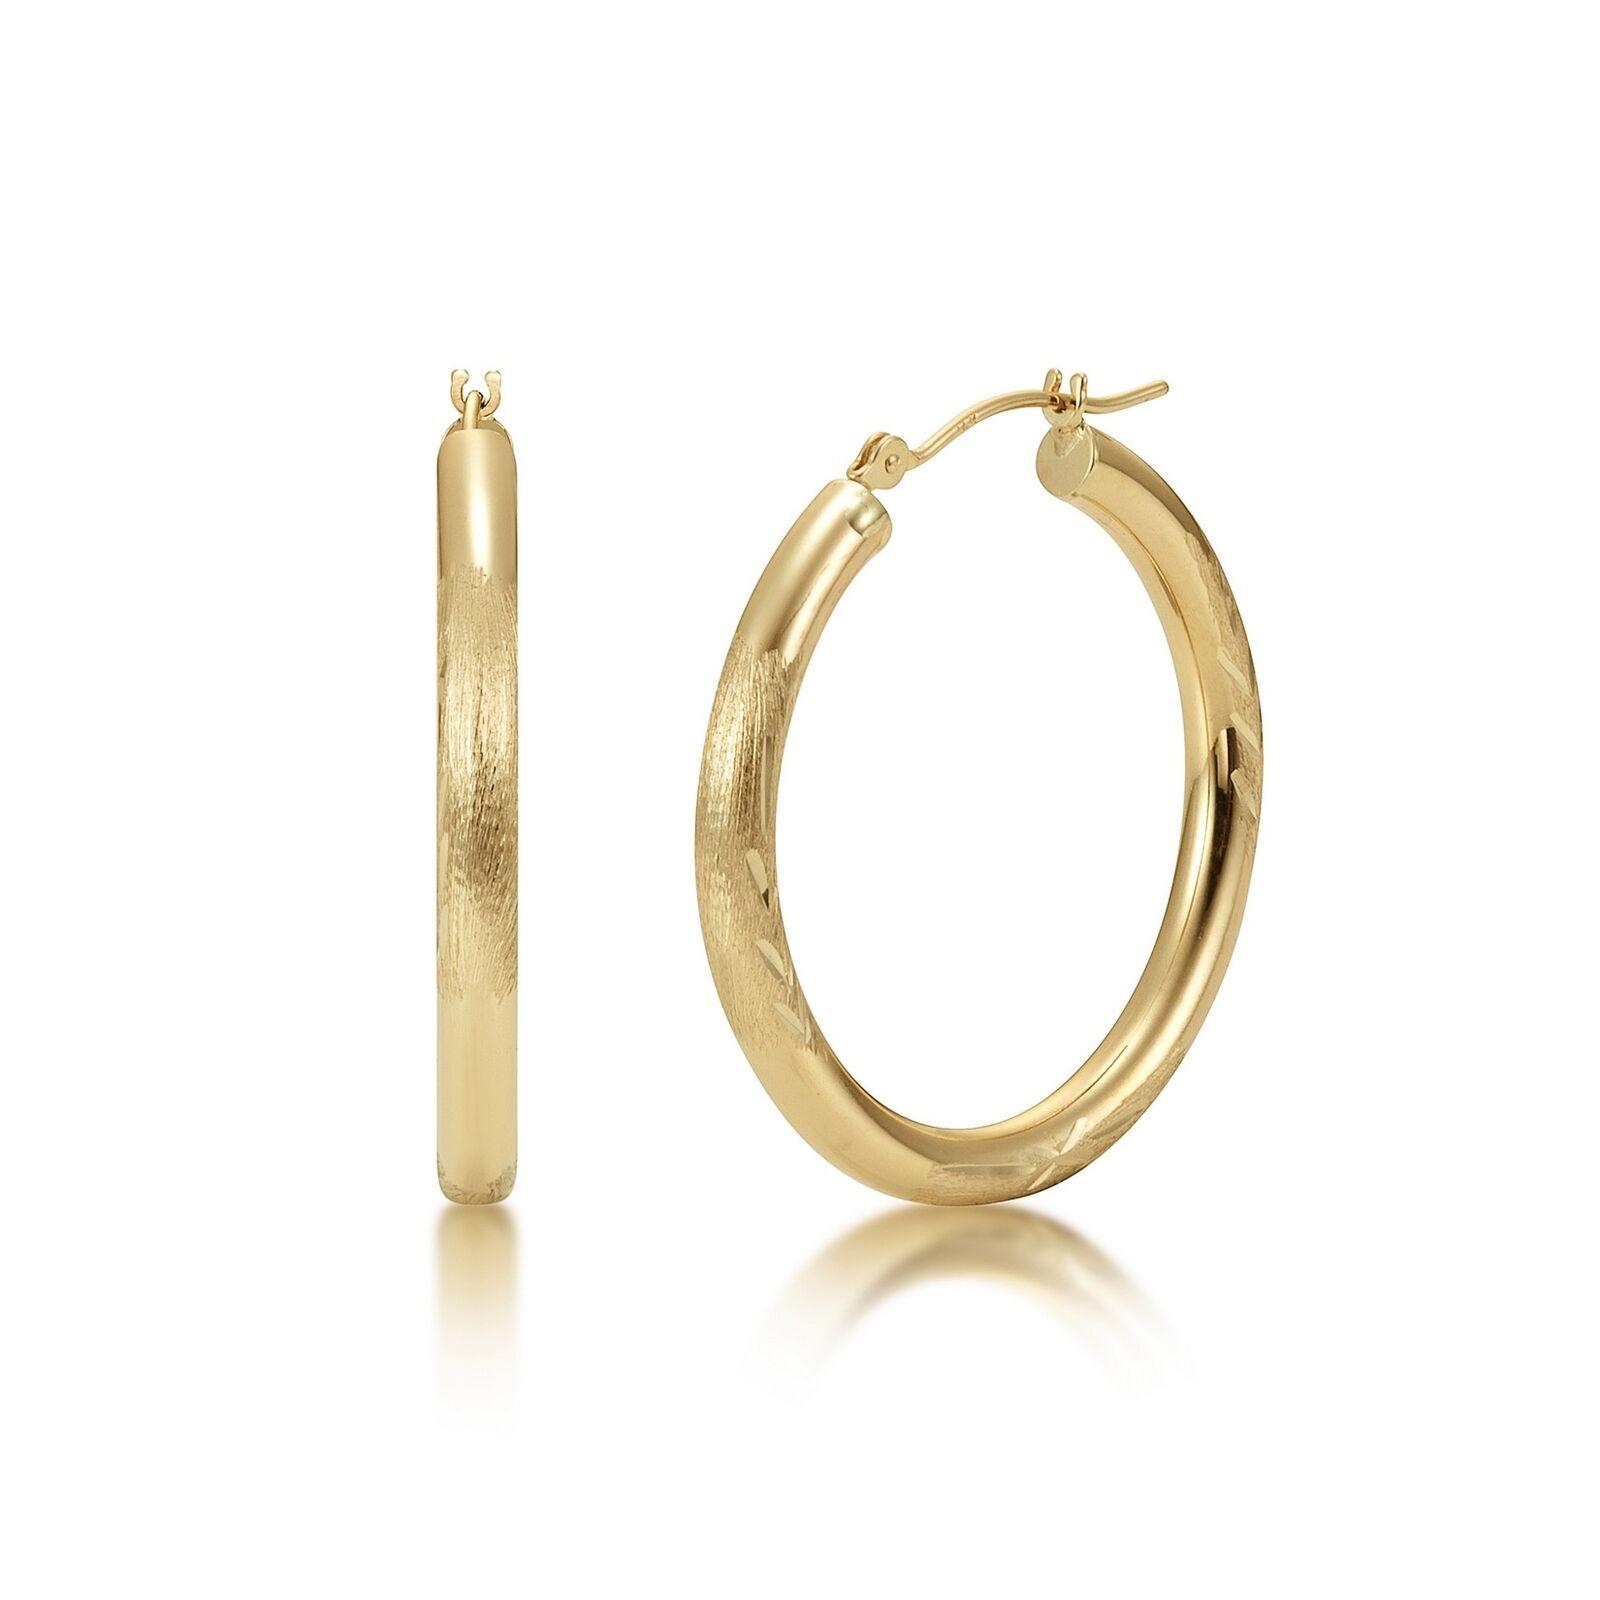 14K gold Hoop Earrings 3mm width Satin Diamond Cut Finish White or Yellow gold